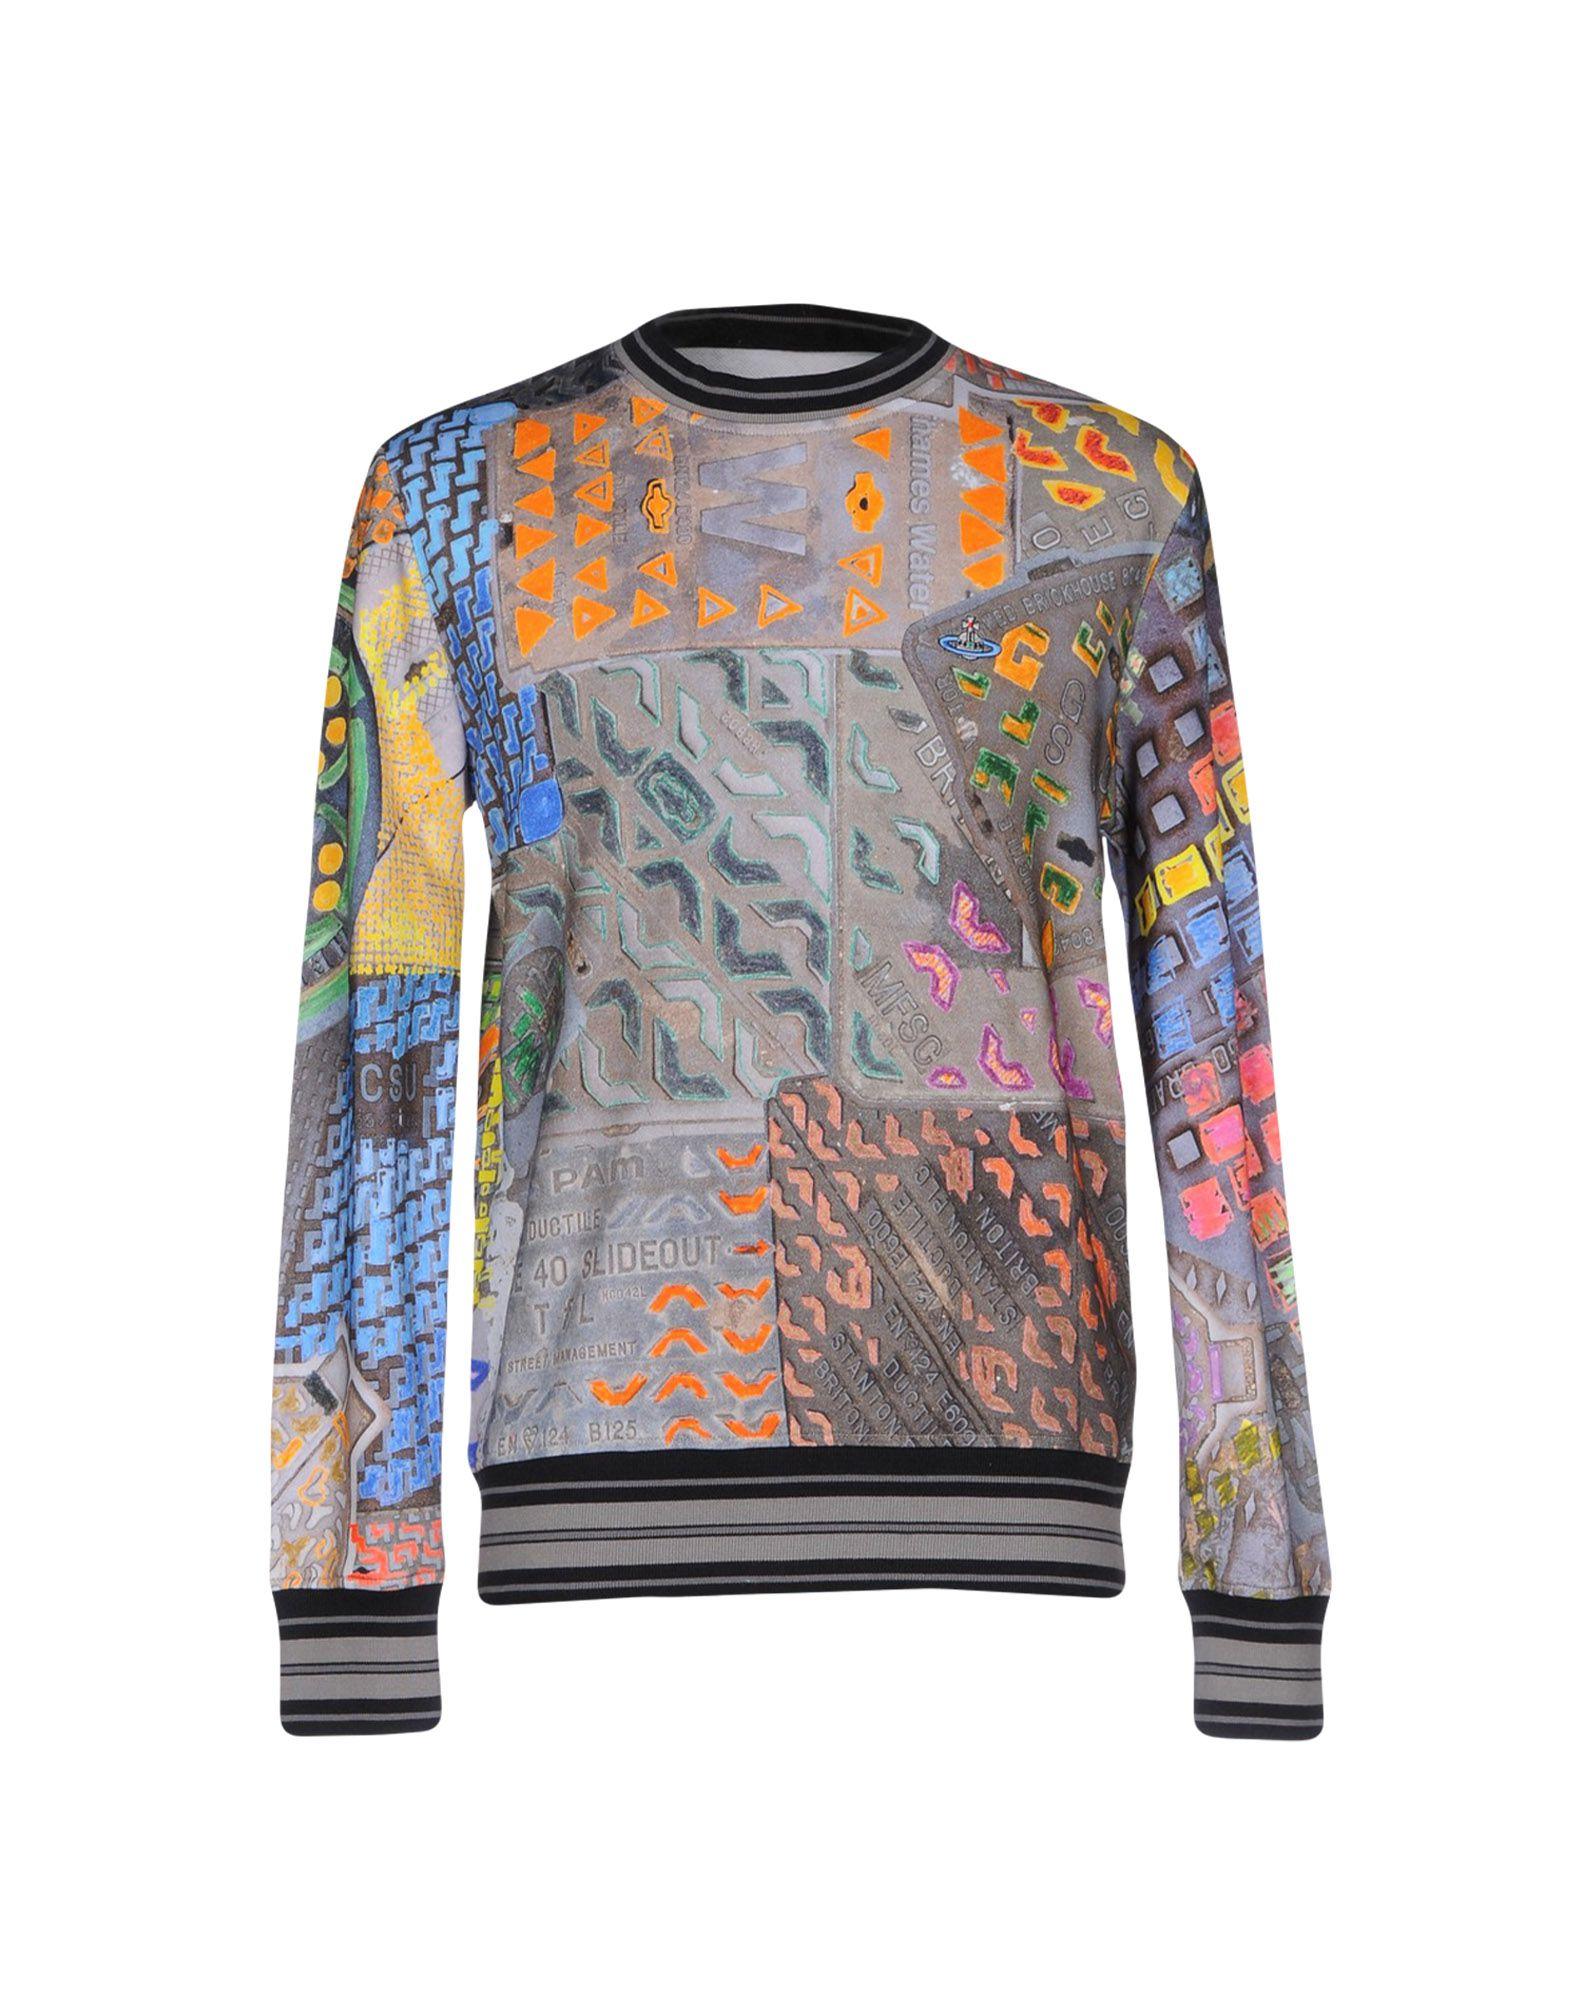 VIVIENNE WESTWOOD MAN Herren Sweatshirt Farbe Grau Größe 6